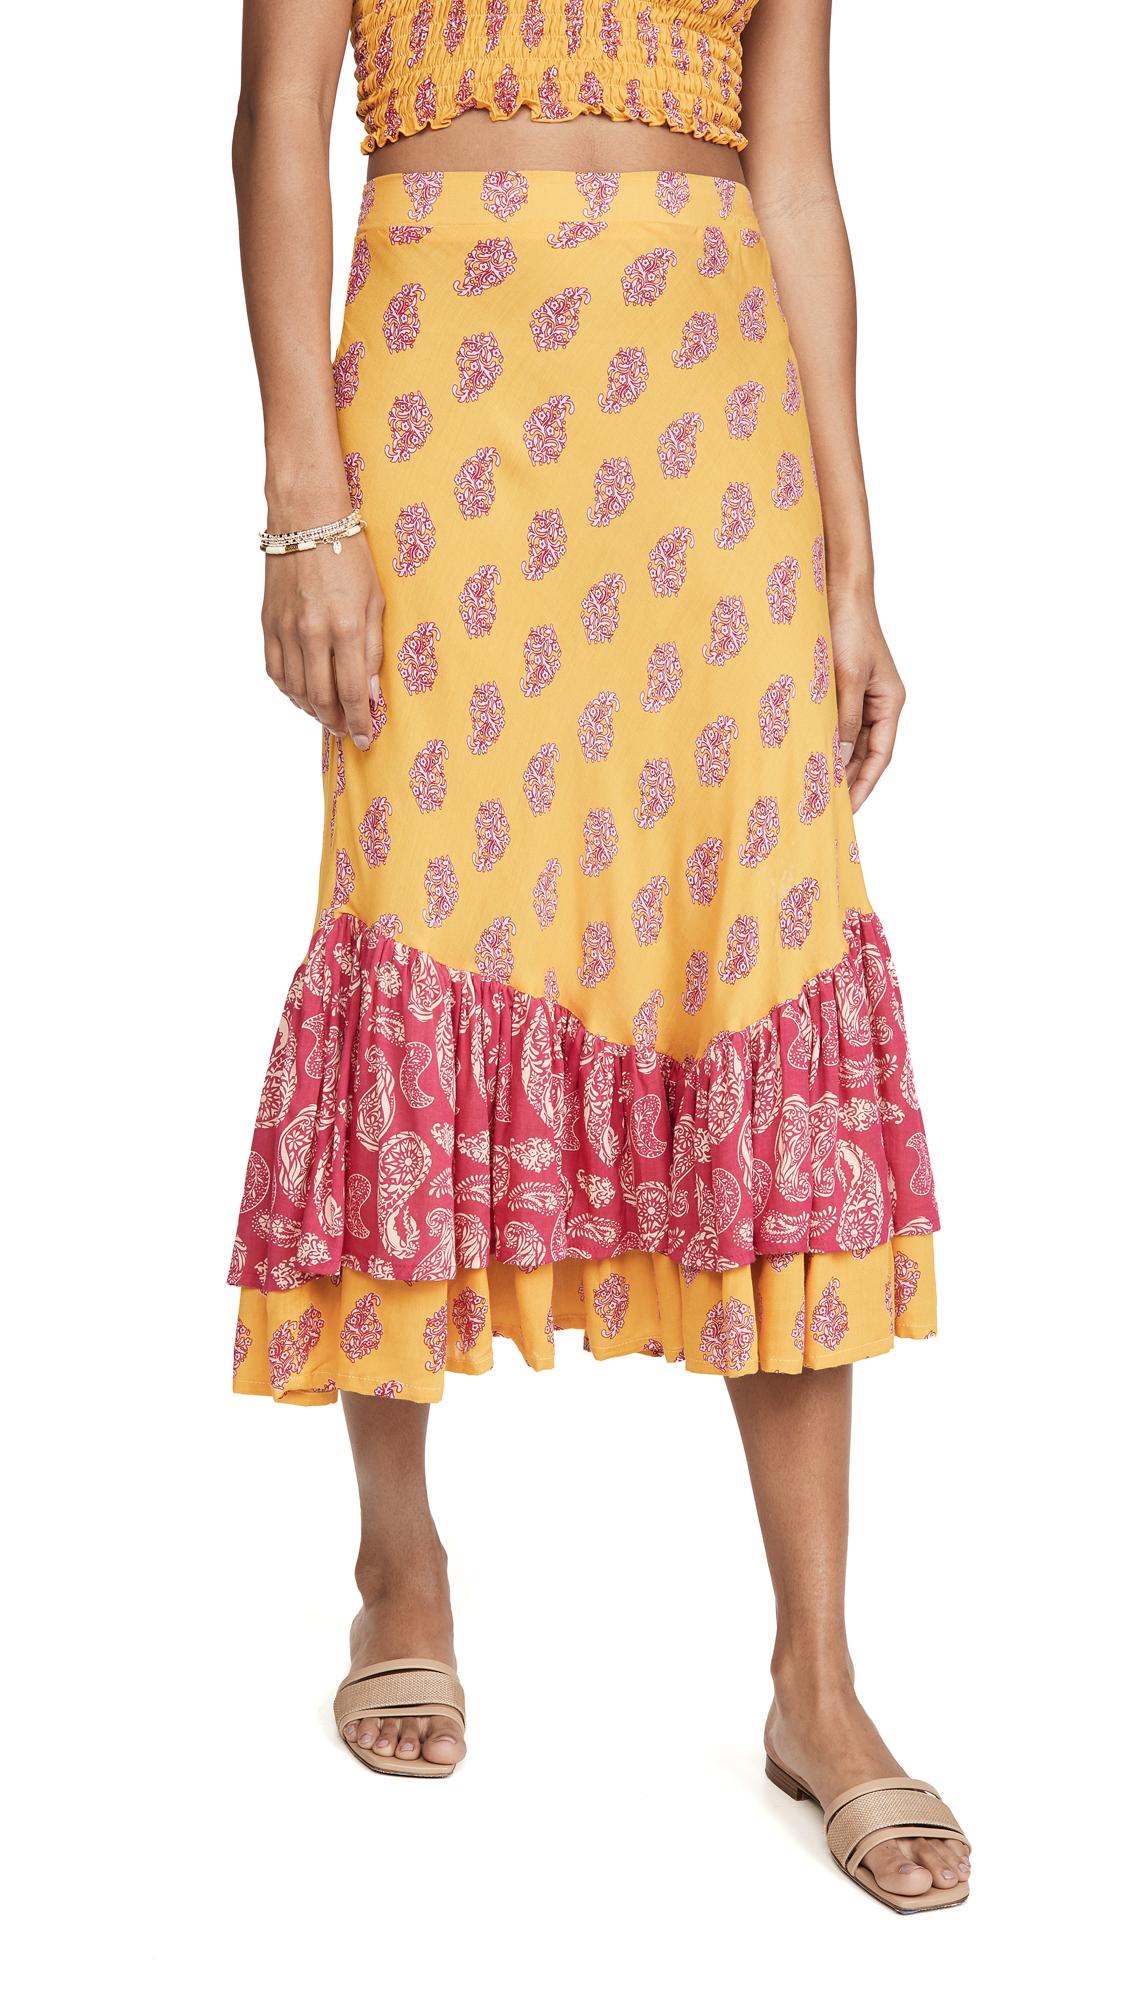 coolchange Florence Skirt